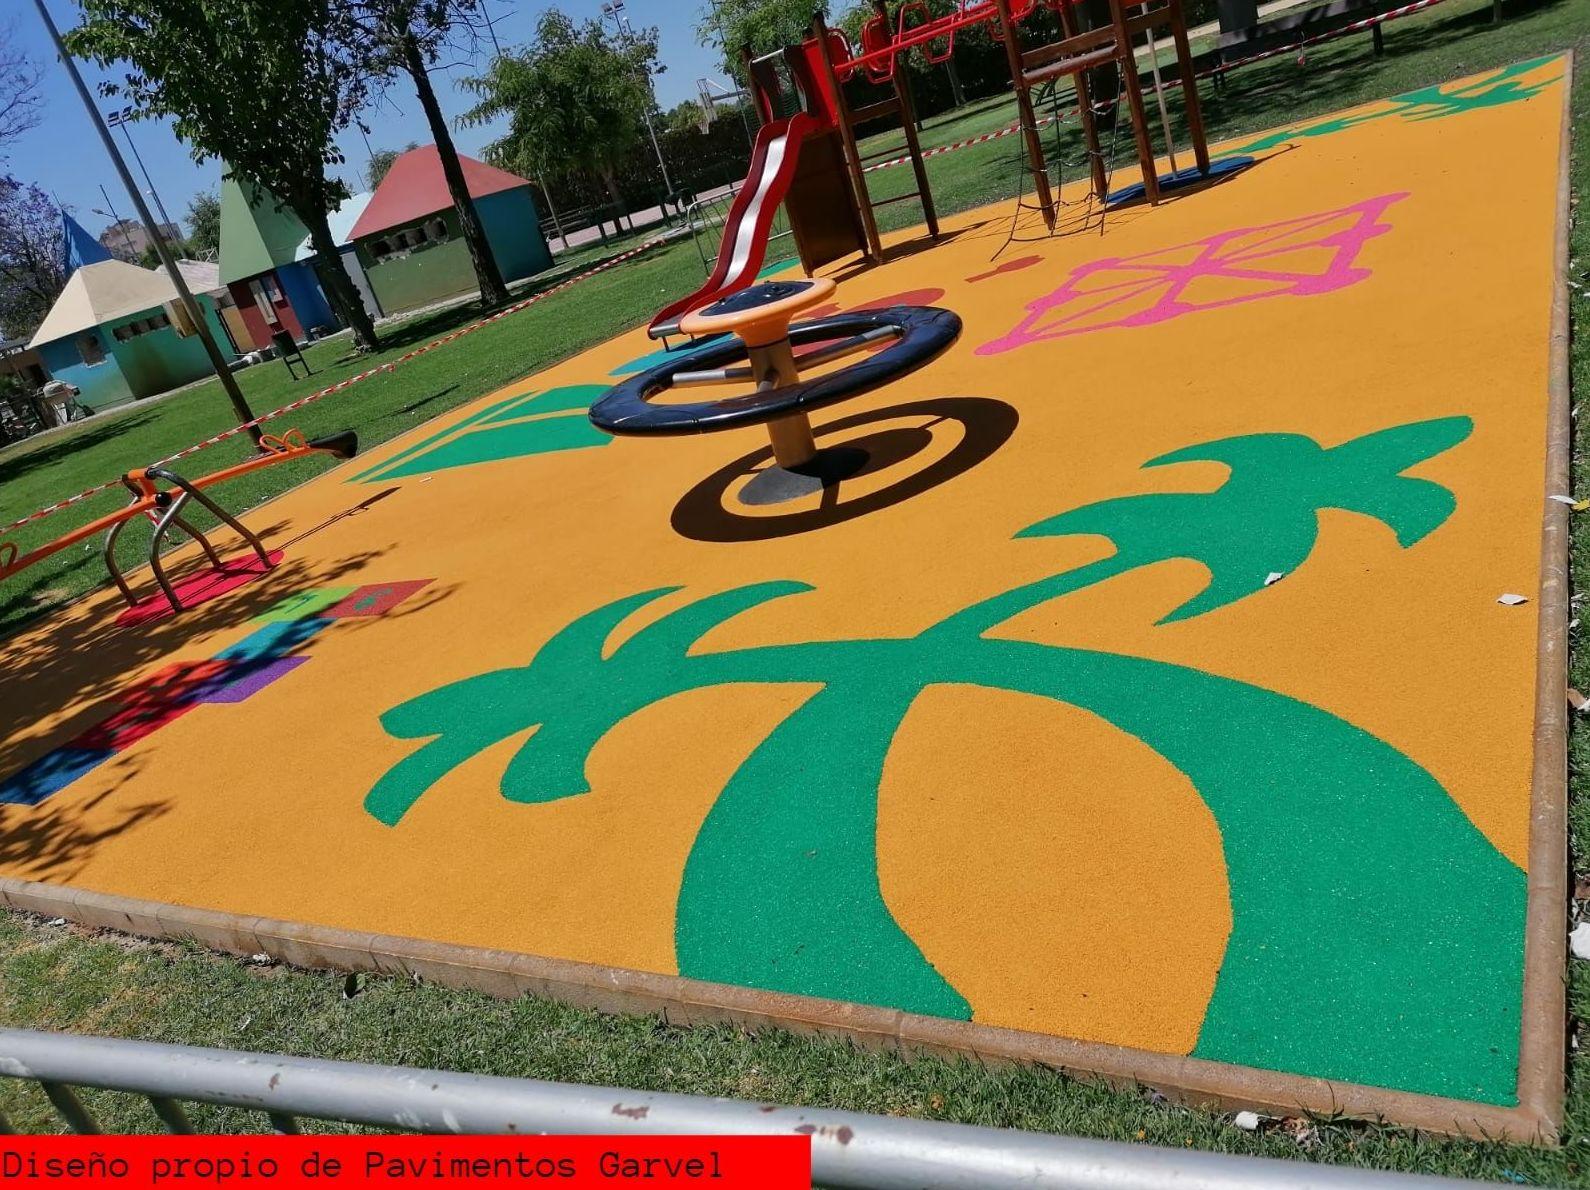 Foto 10 de Instalación de pavimentos de caucho para parques infantiles en Las Cabezas de San Juan   Pavimentos Garvel